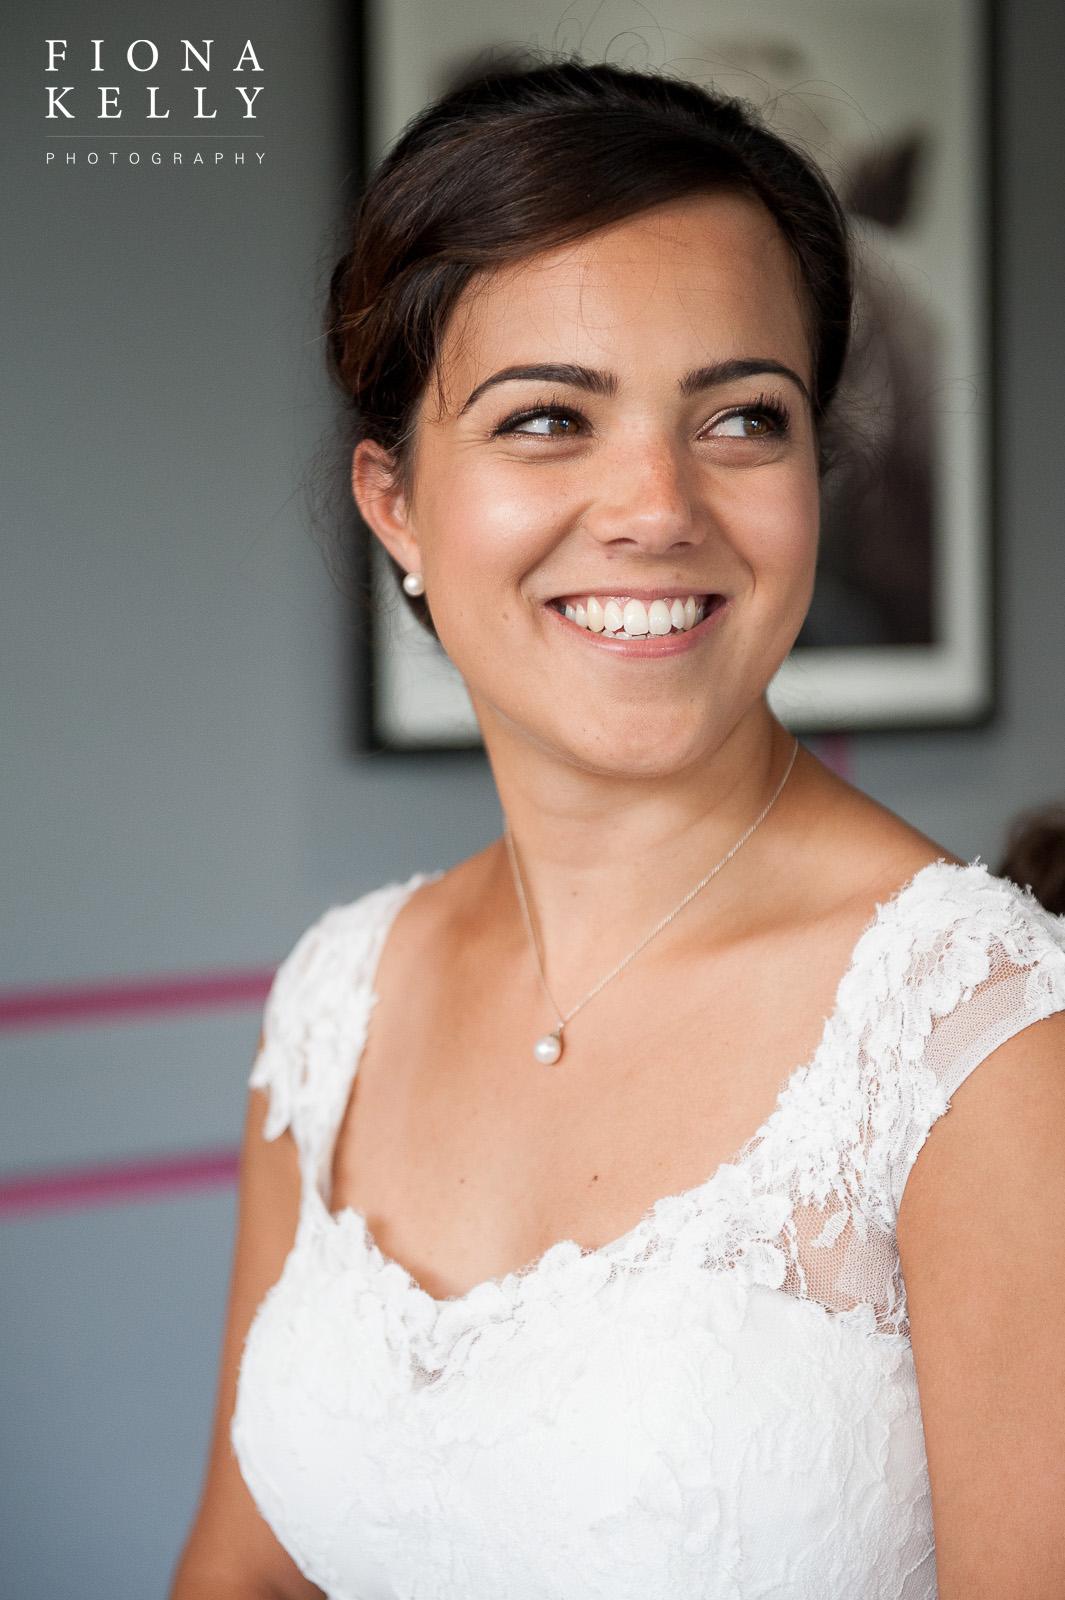 Bridal hair styling Surrey